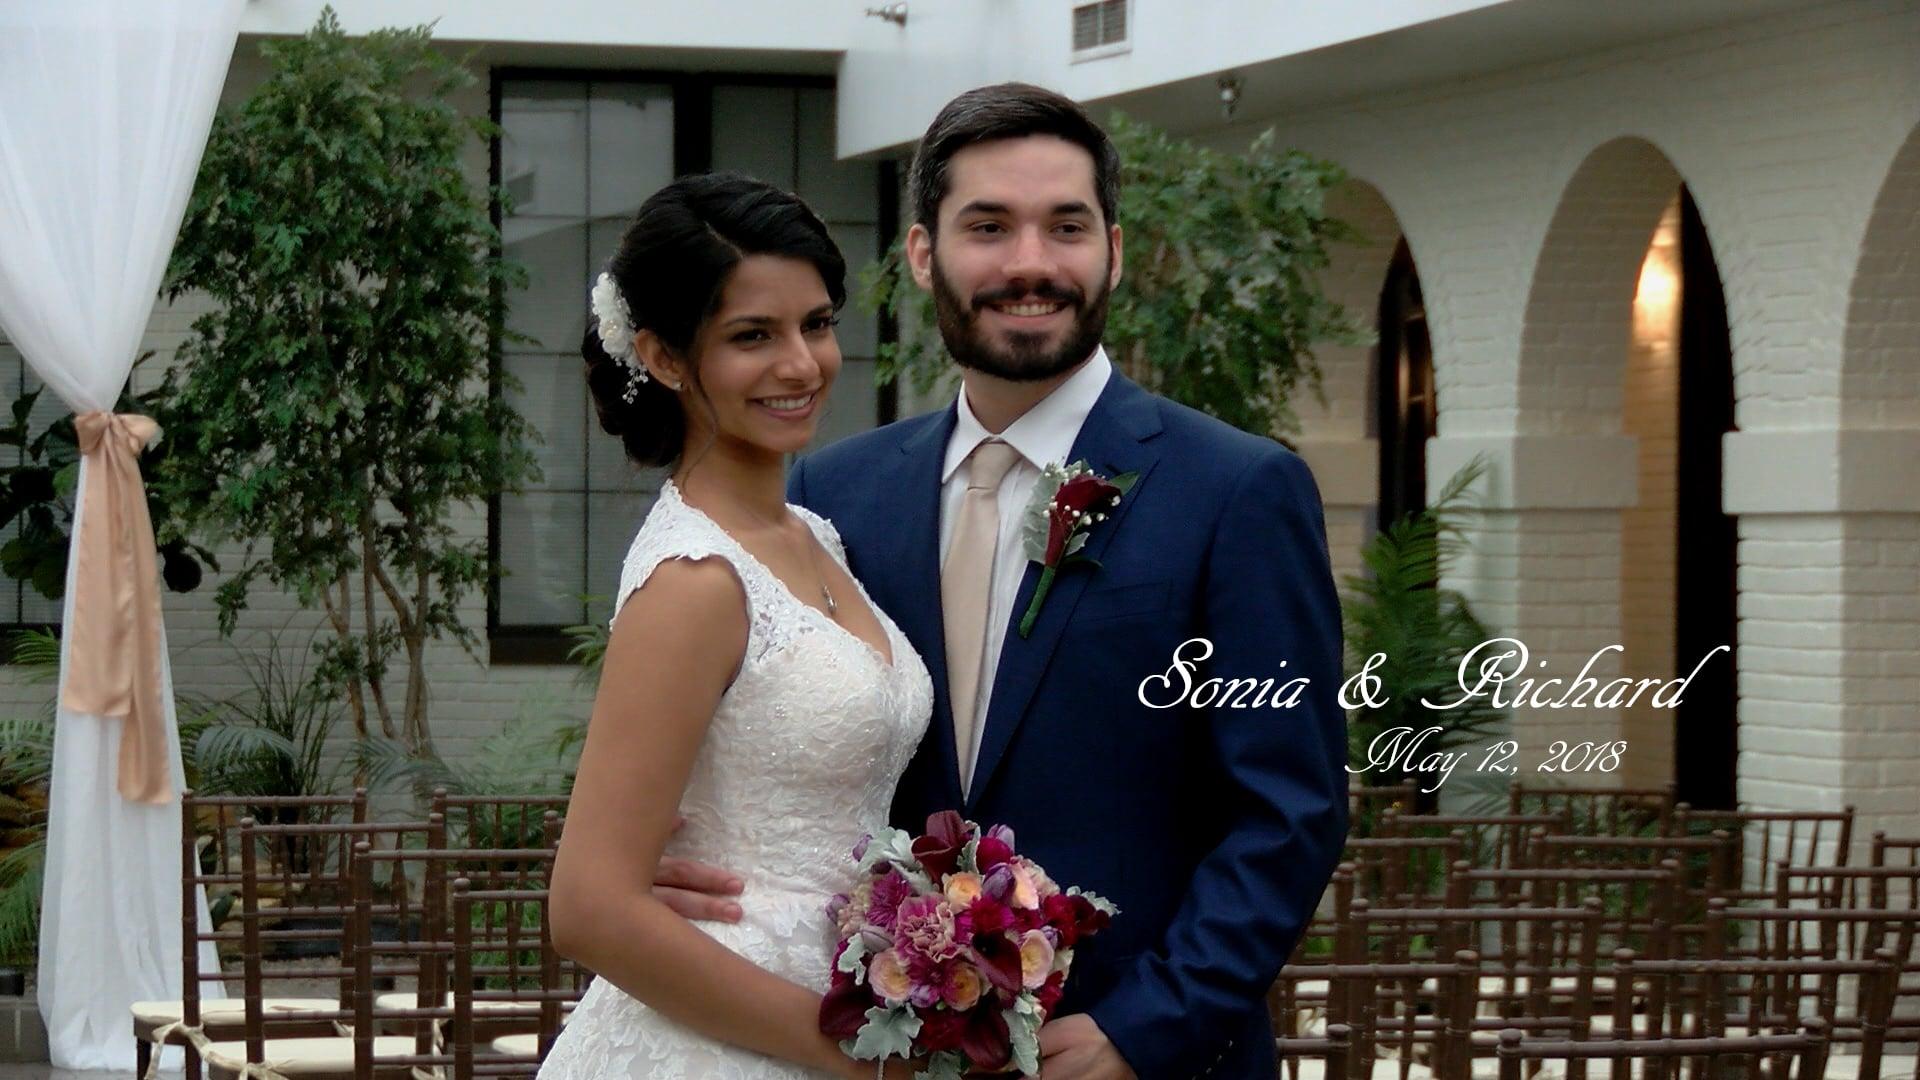 Sonia & Richard 5-12-18